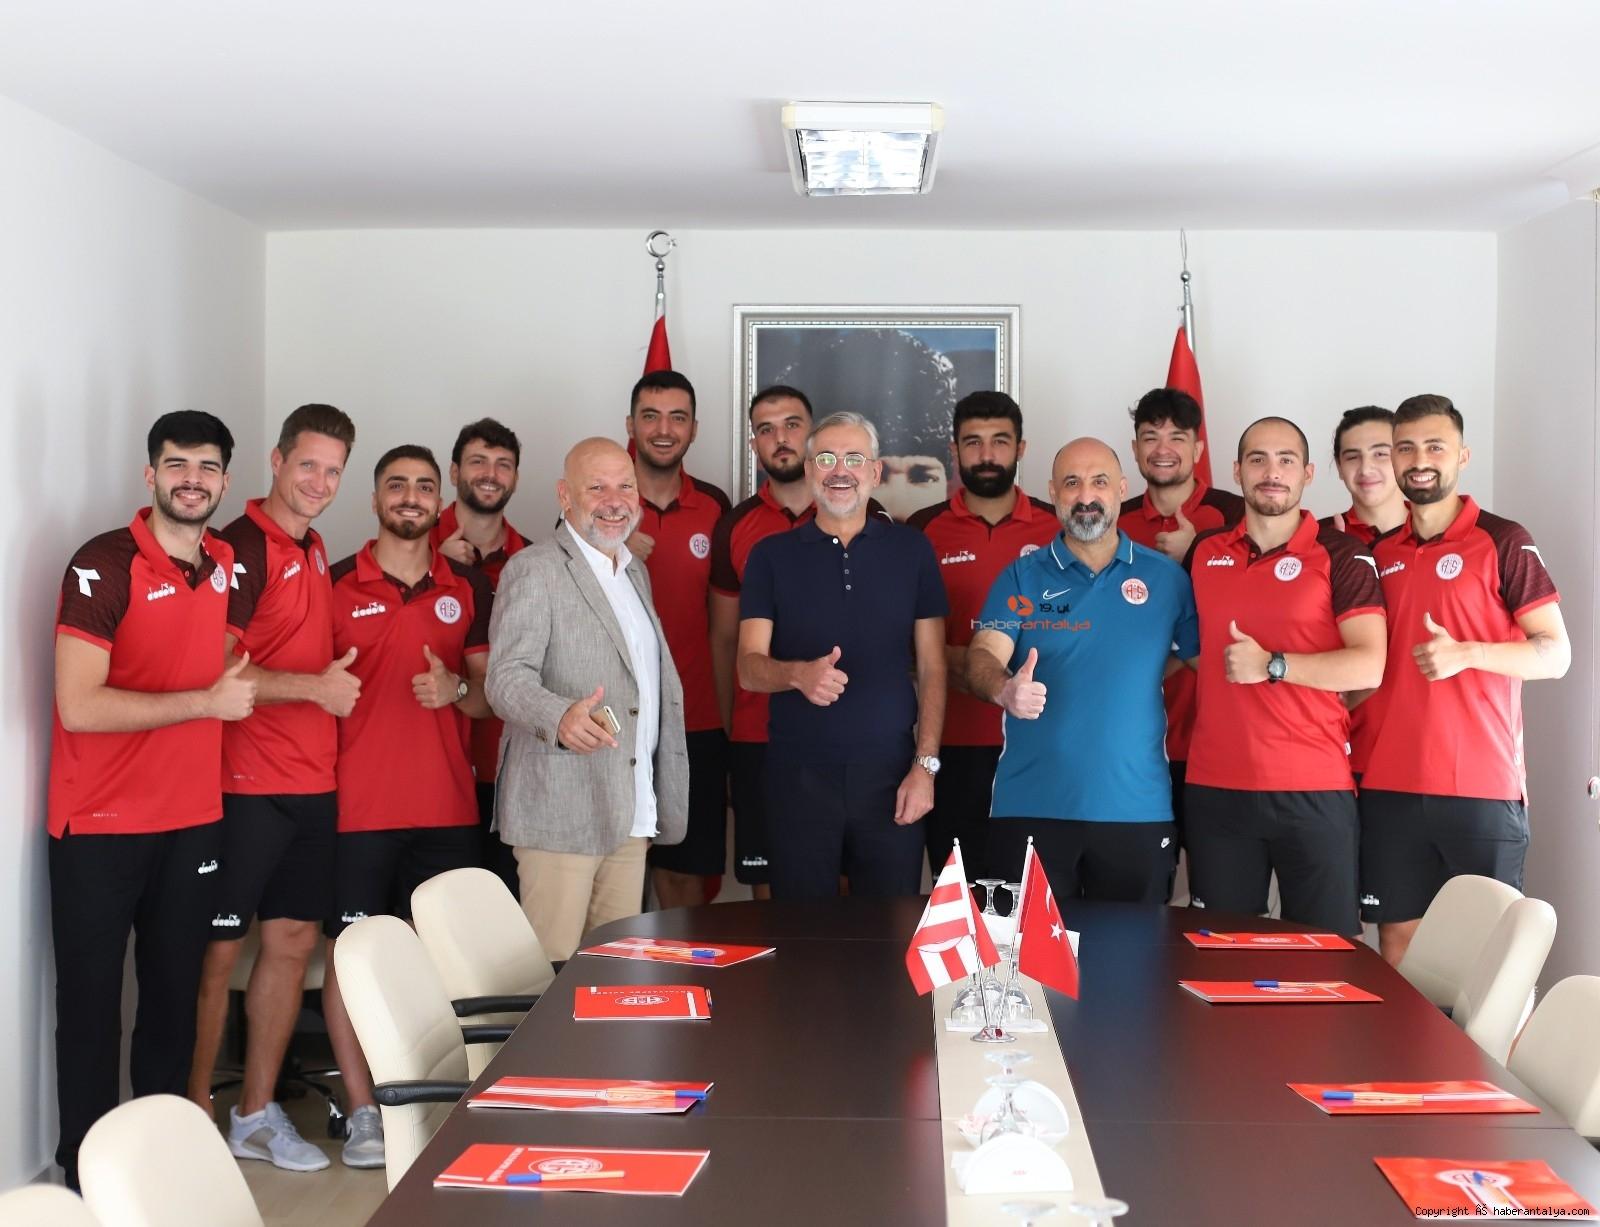 2021/09/antalyaspor-hentbol-takimi-11-oyuncu-ile-sozlesme-imzaladi-20210916AW41-2.jpg